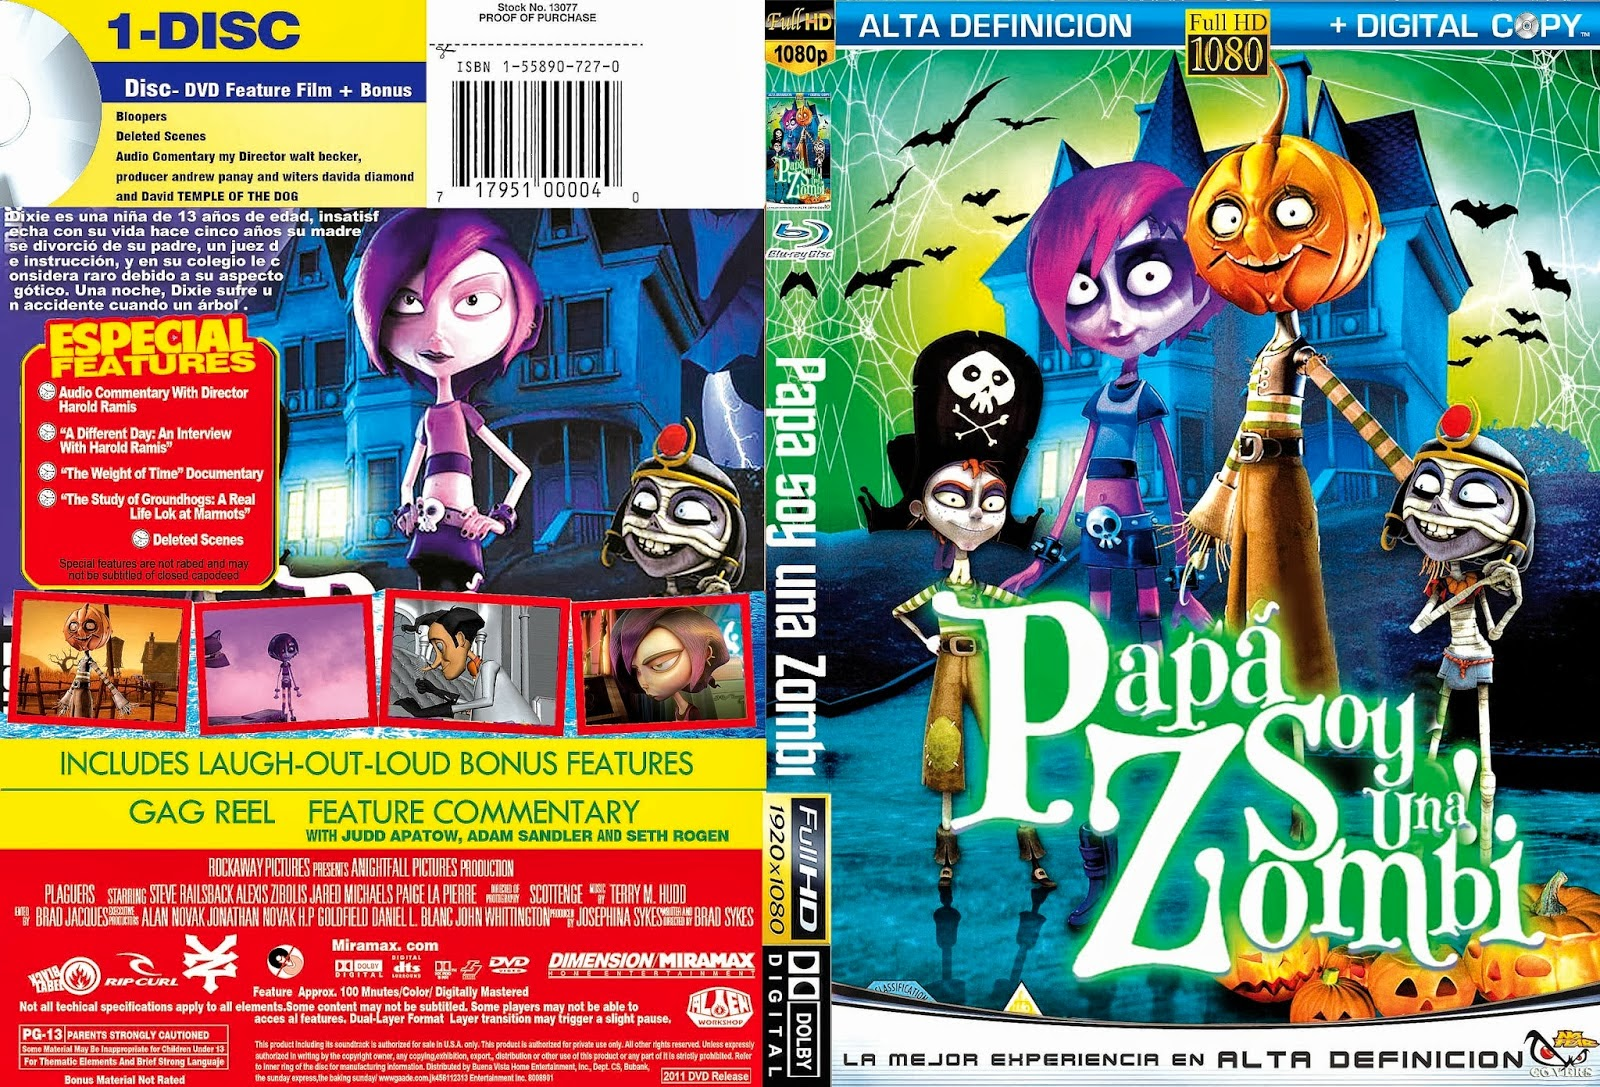 Download Papai, Eu sou Uma Zumbi DVDRip XviD Dublado daddy i  2527 m a zombie   PAPA SOY UN ZOMBI coverdvdgratis